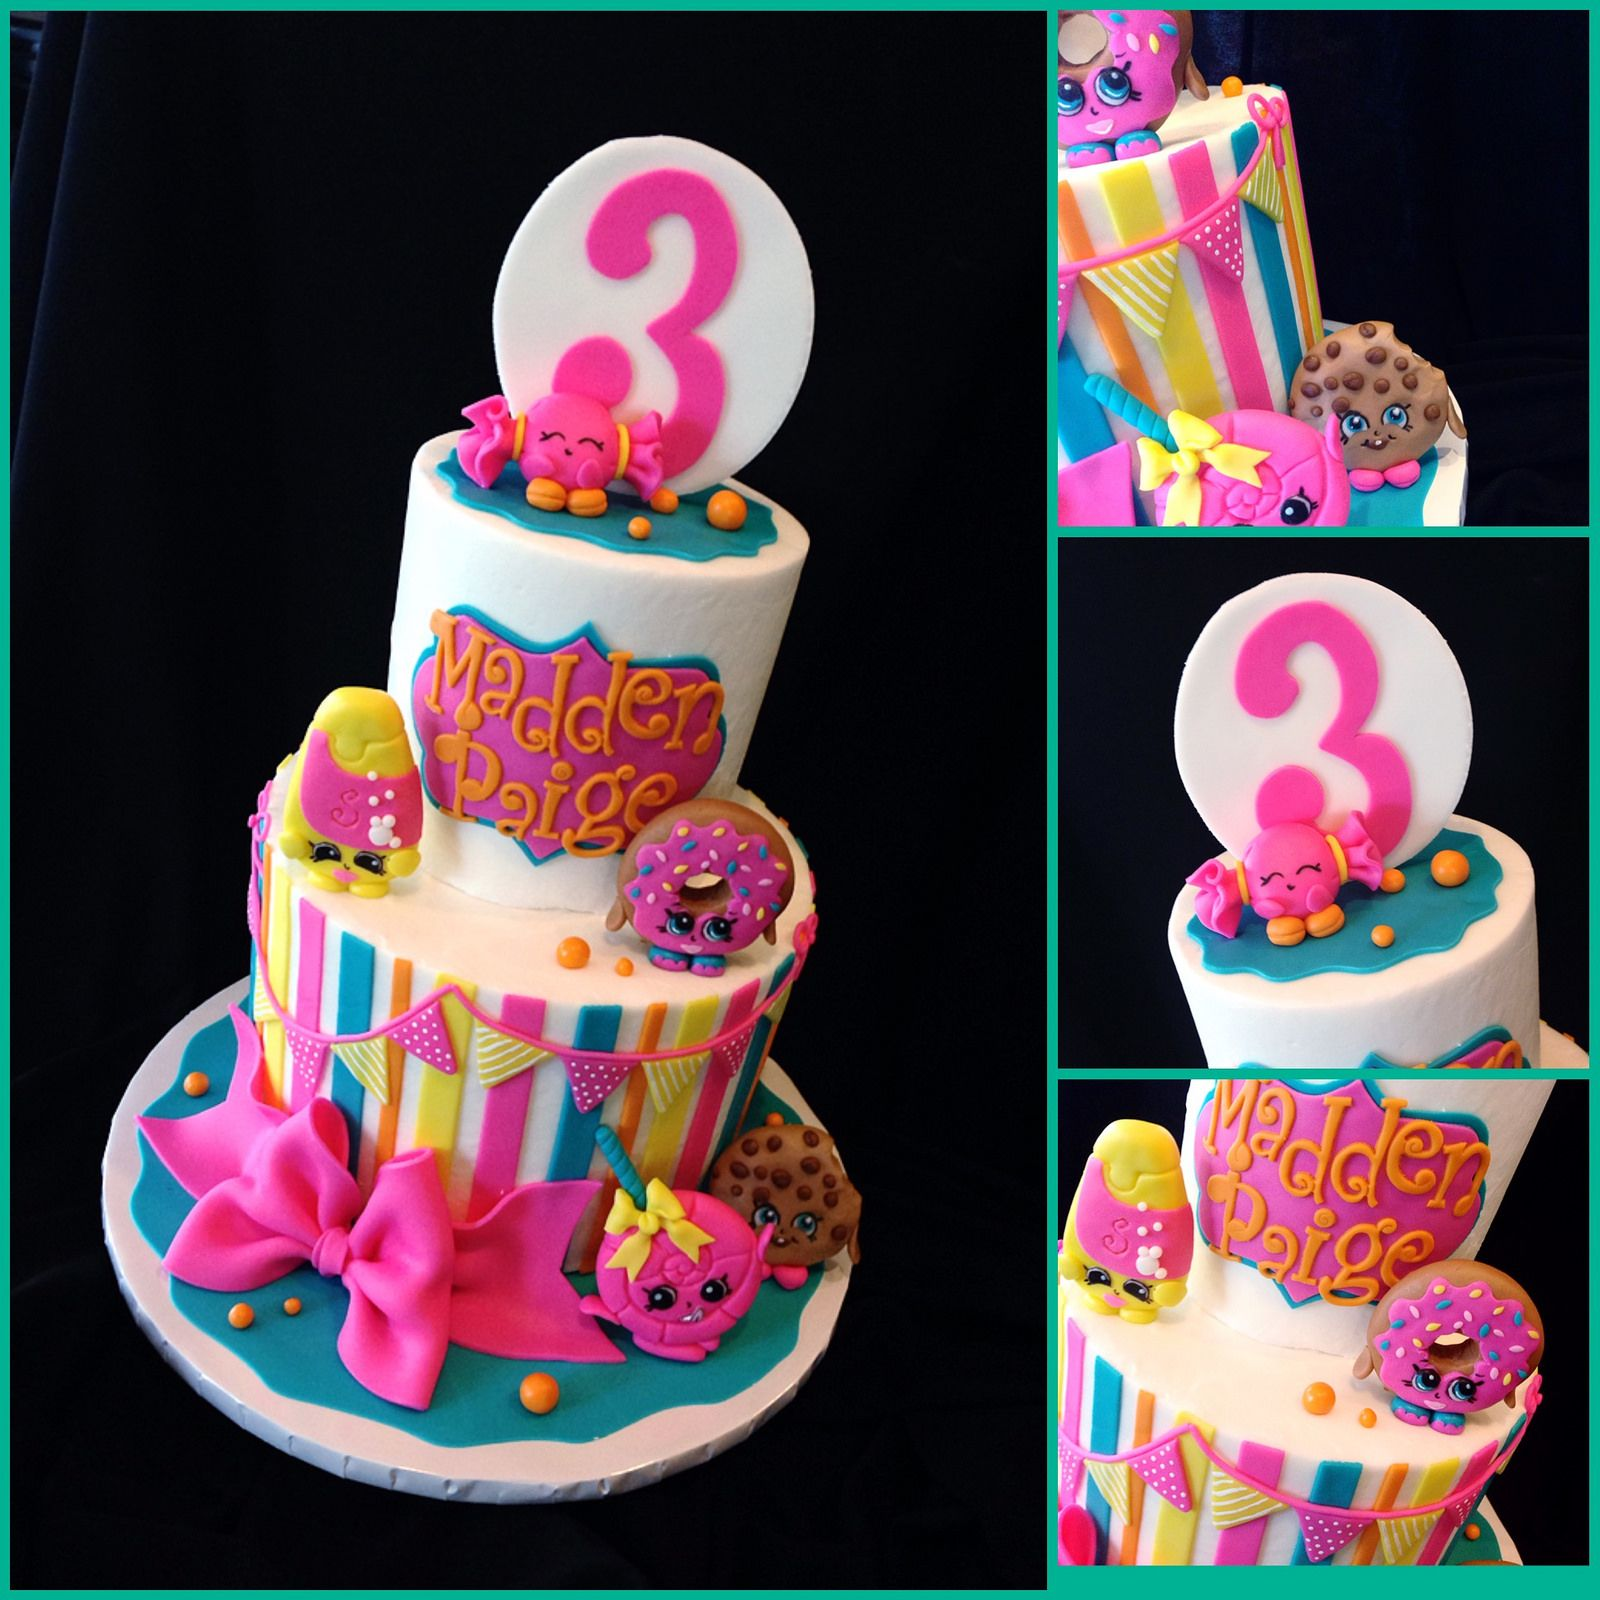 Cute Shopkins Birthday Cake Girl Birthday Cakes Pinterest - Cute easy birthday cakes